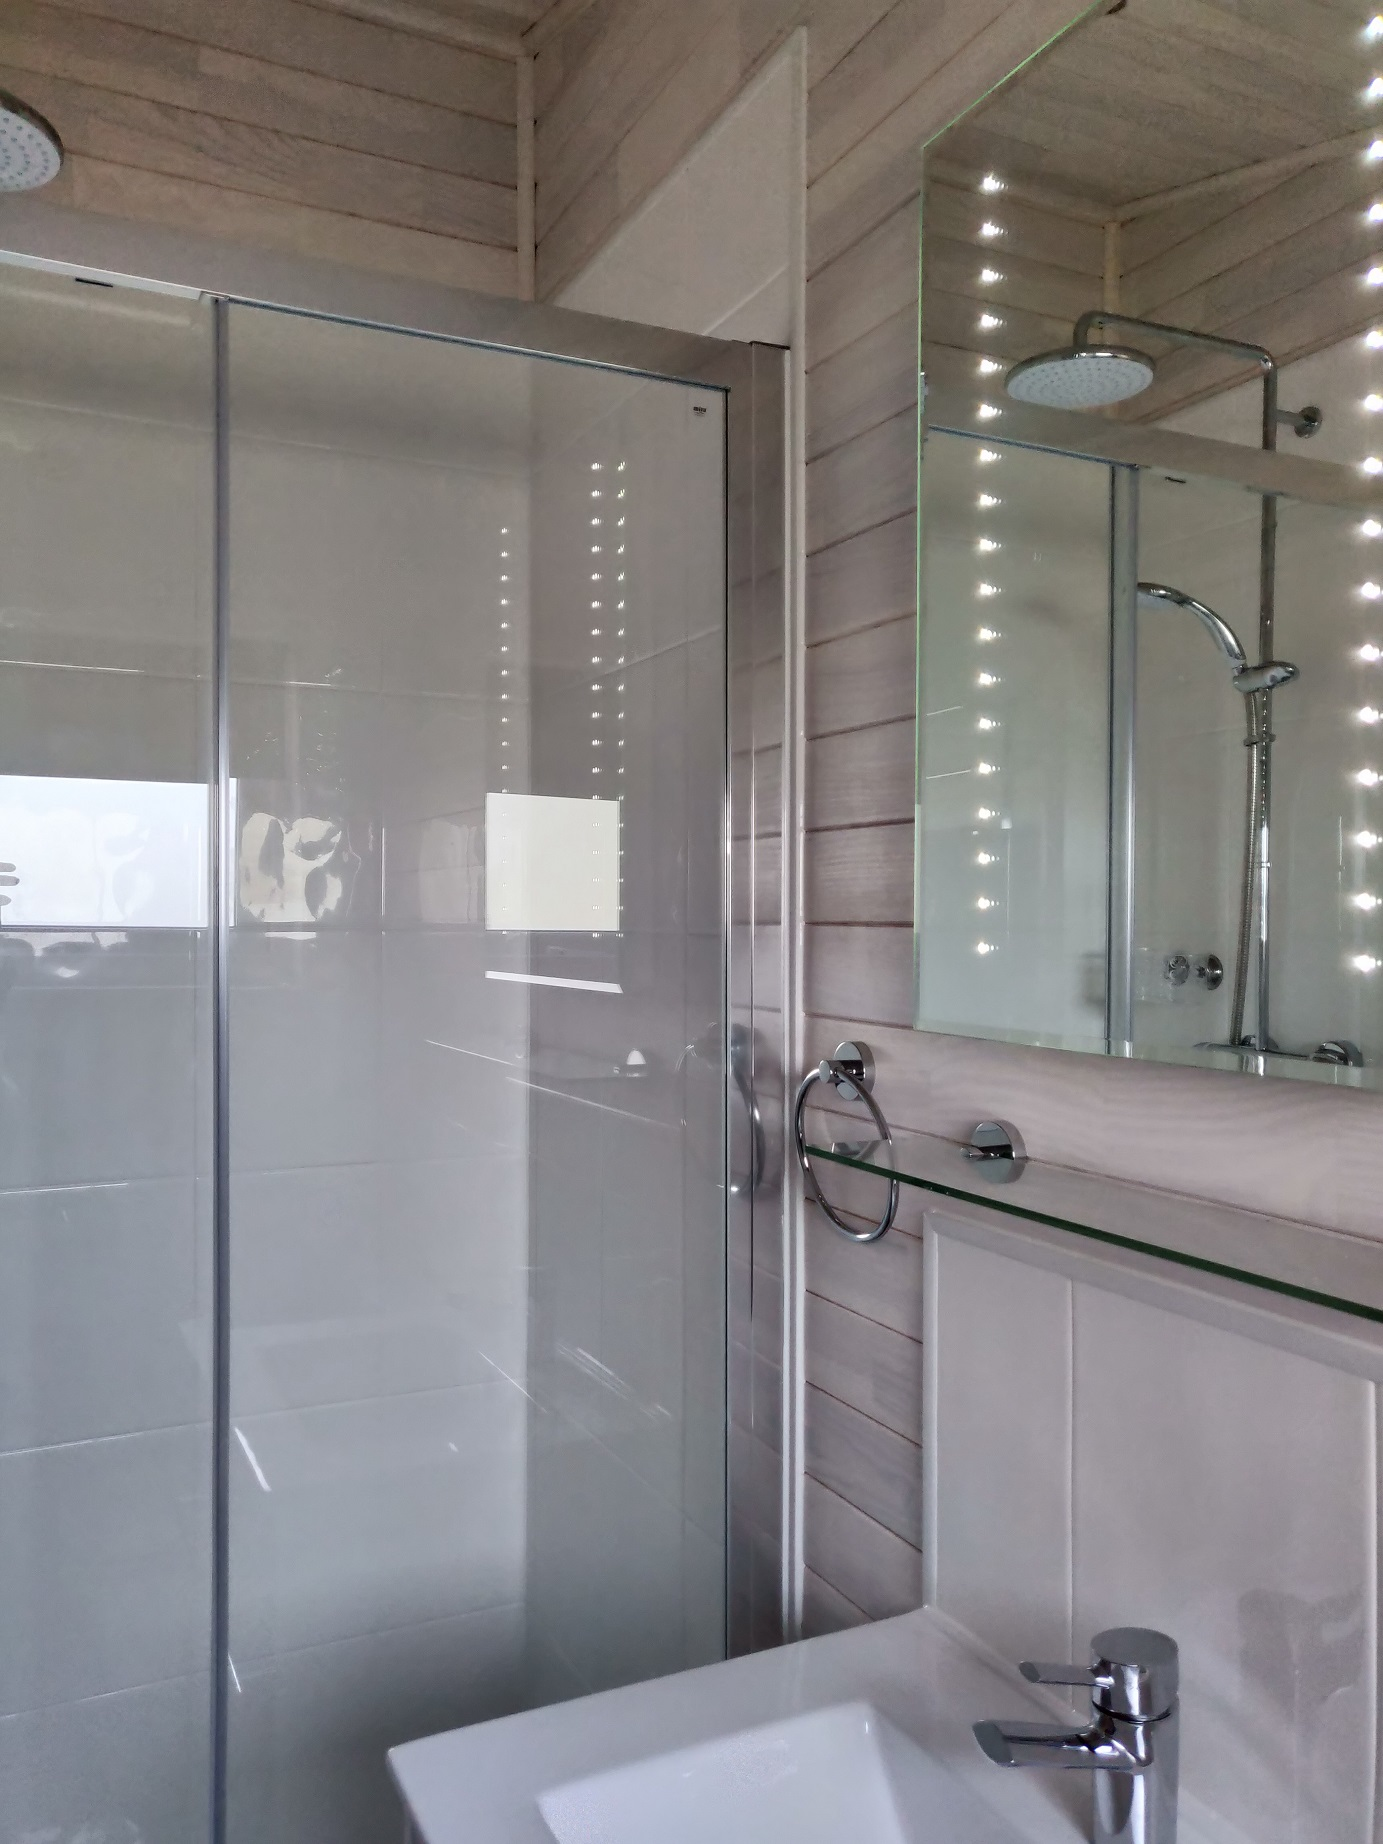 King or Oyster shower.jpg